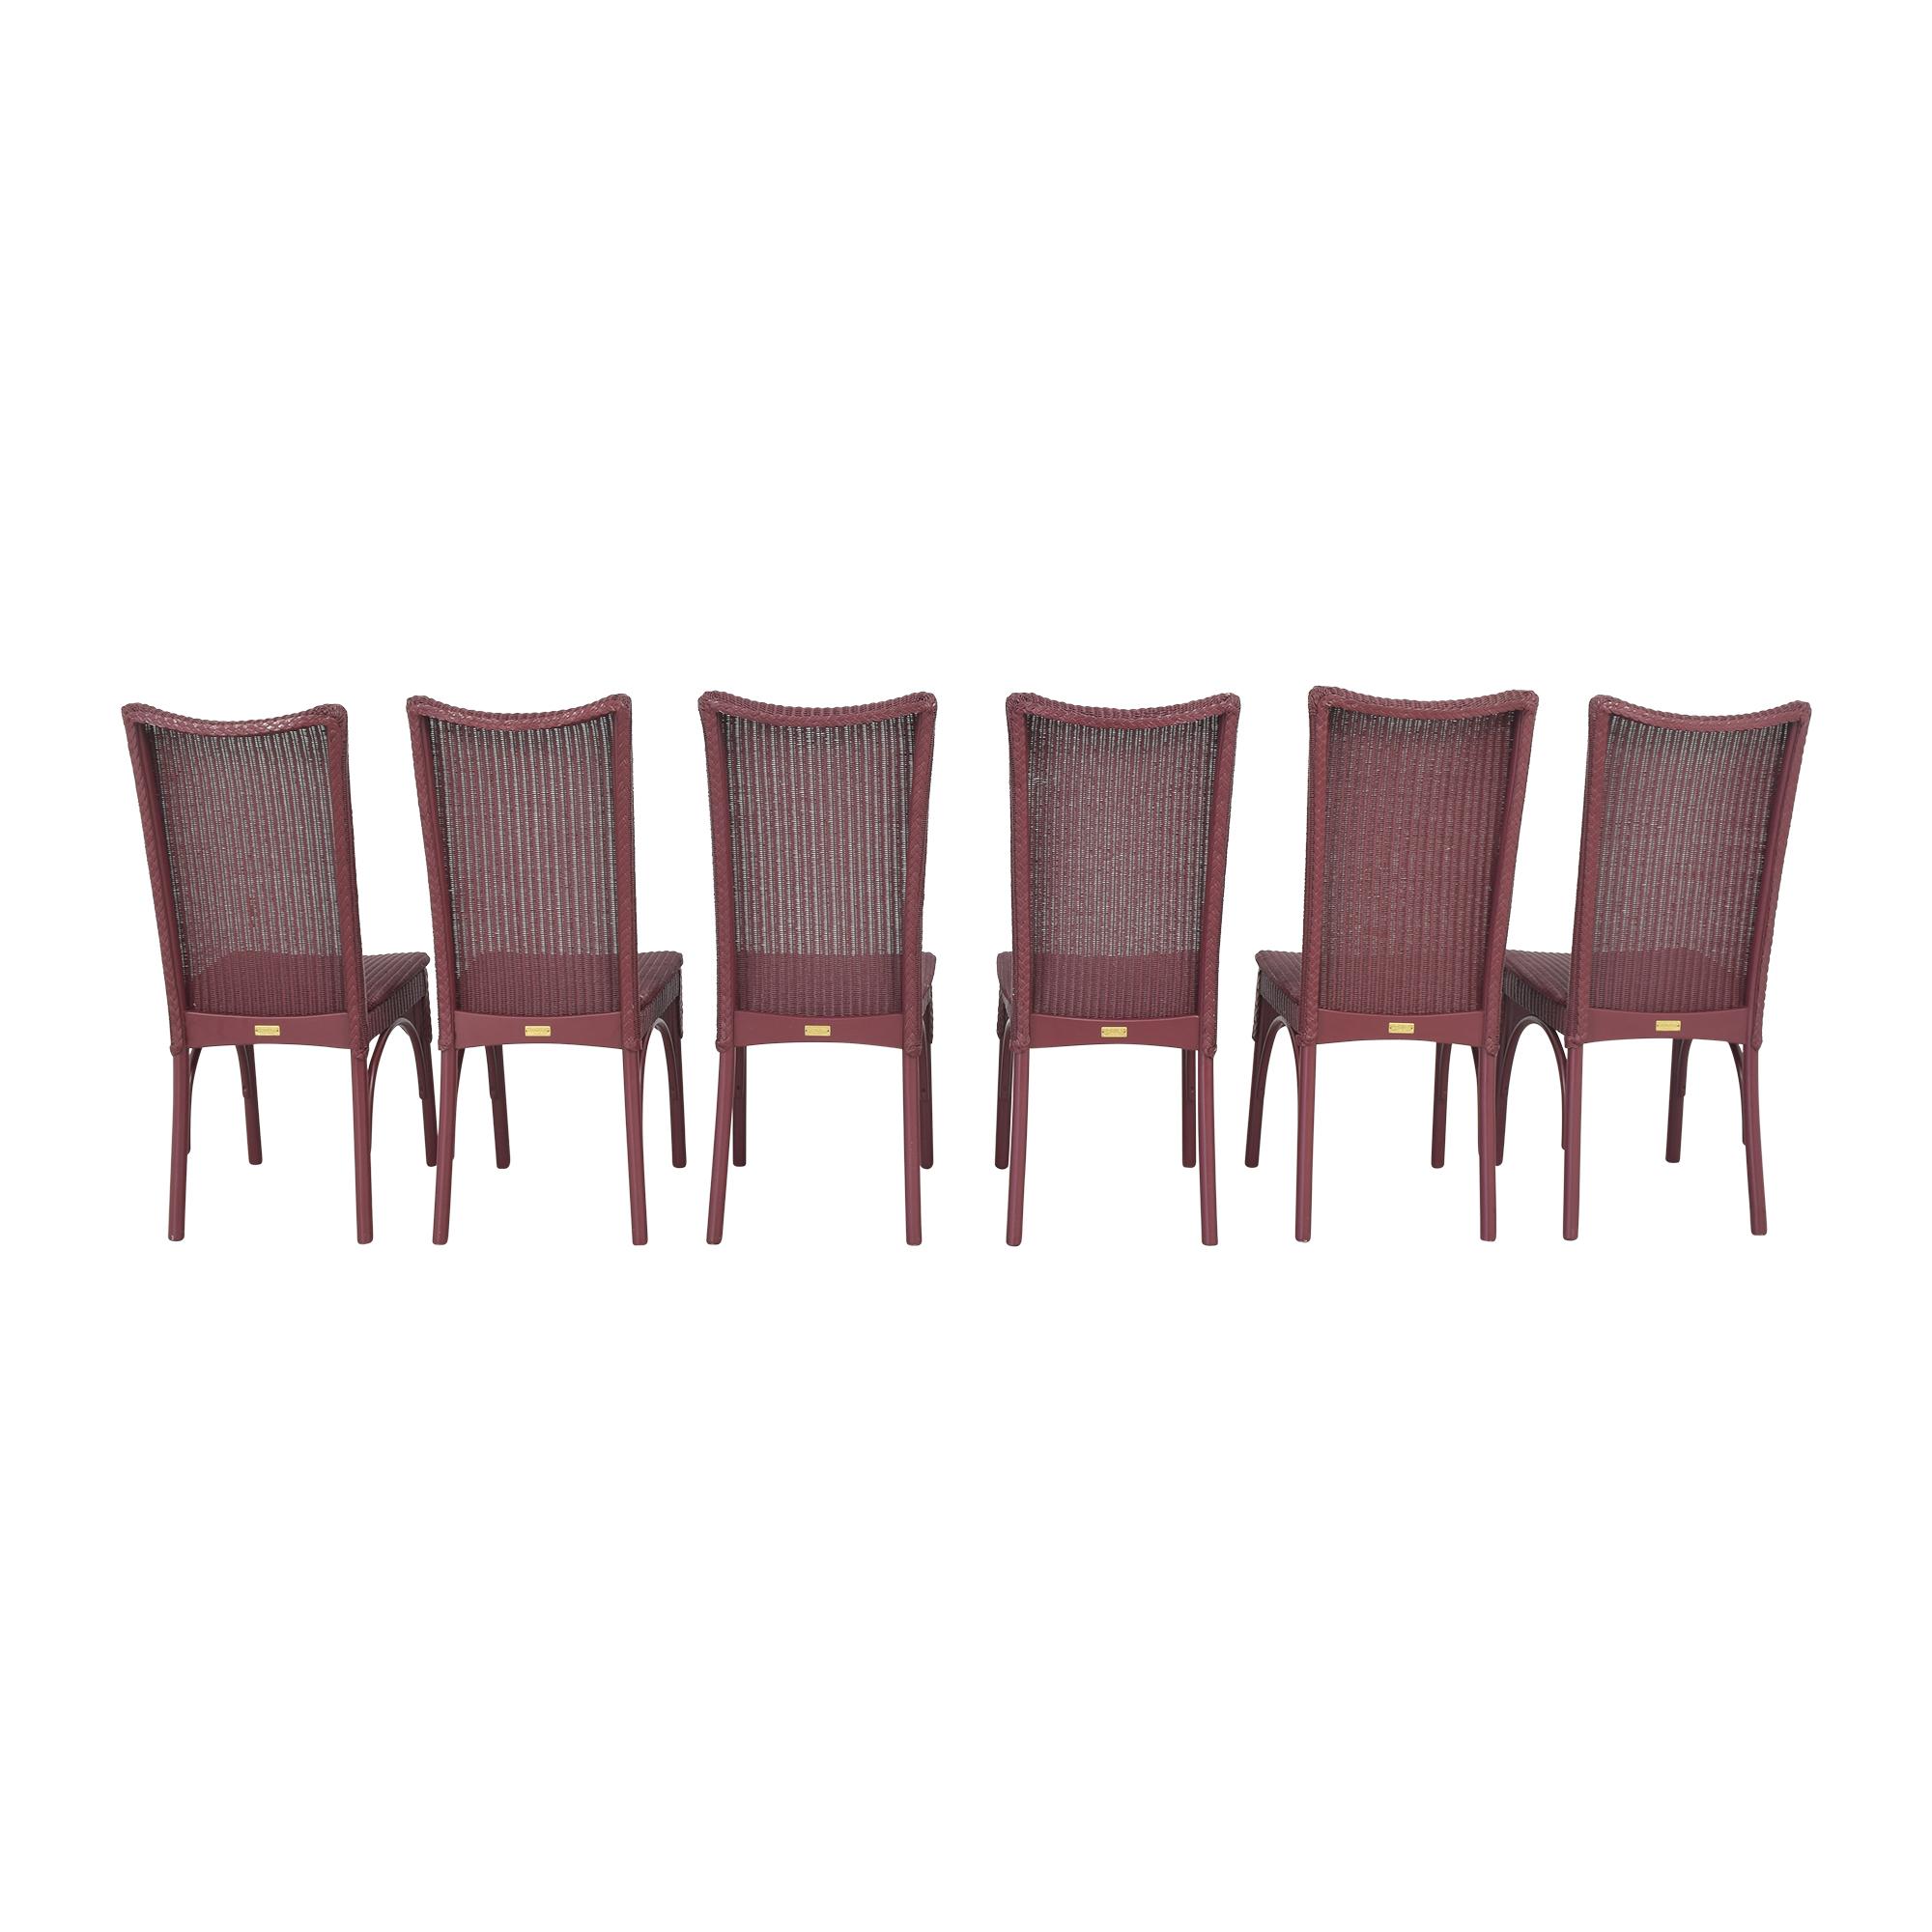 Loom USA Loom High Back Dining Chairs Dining Chairs